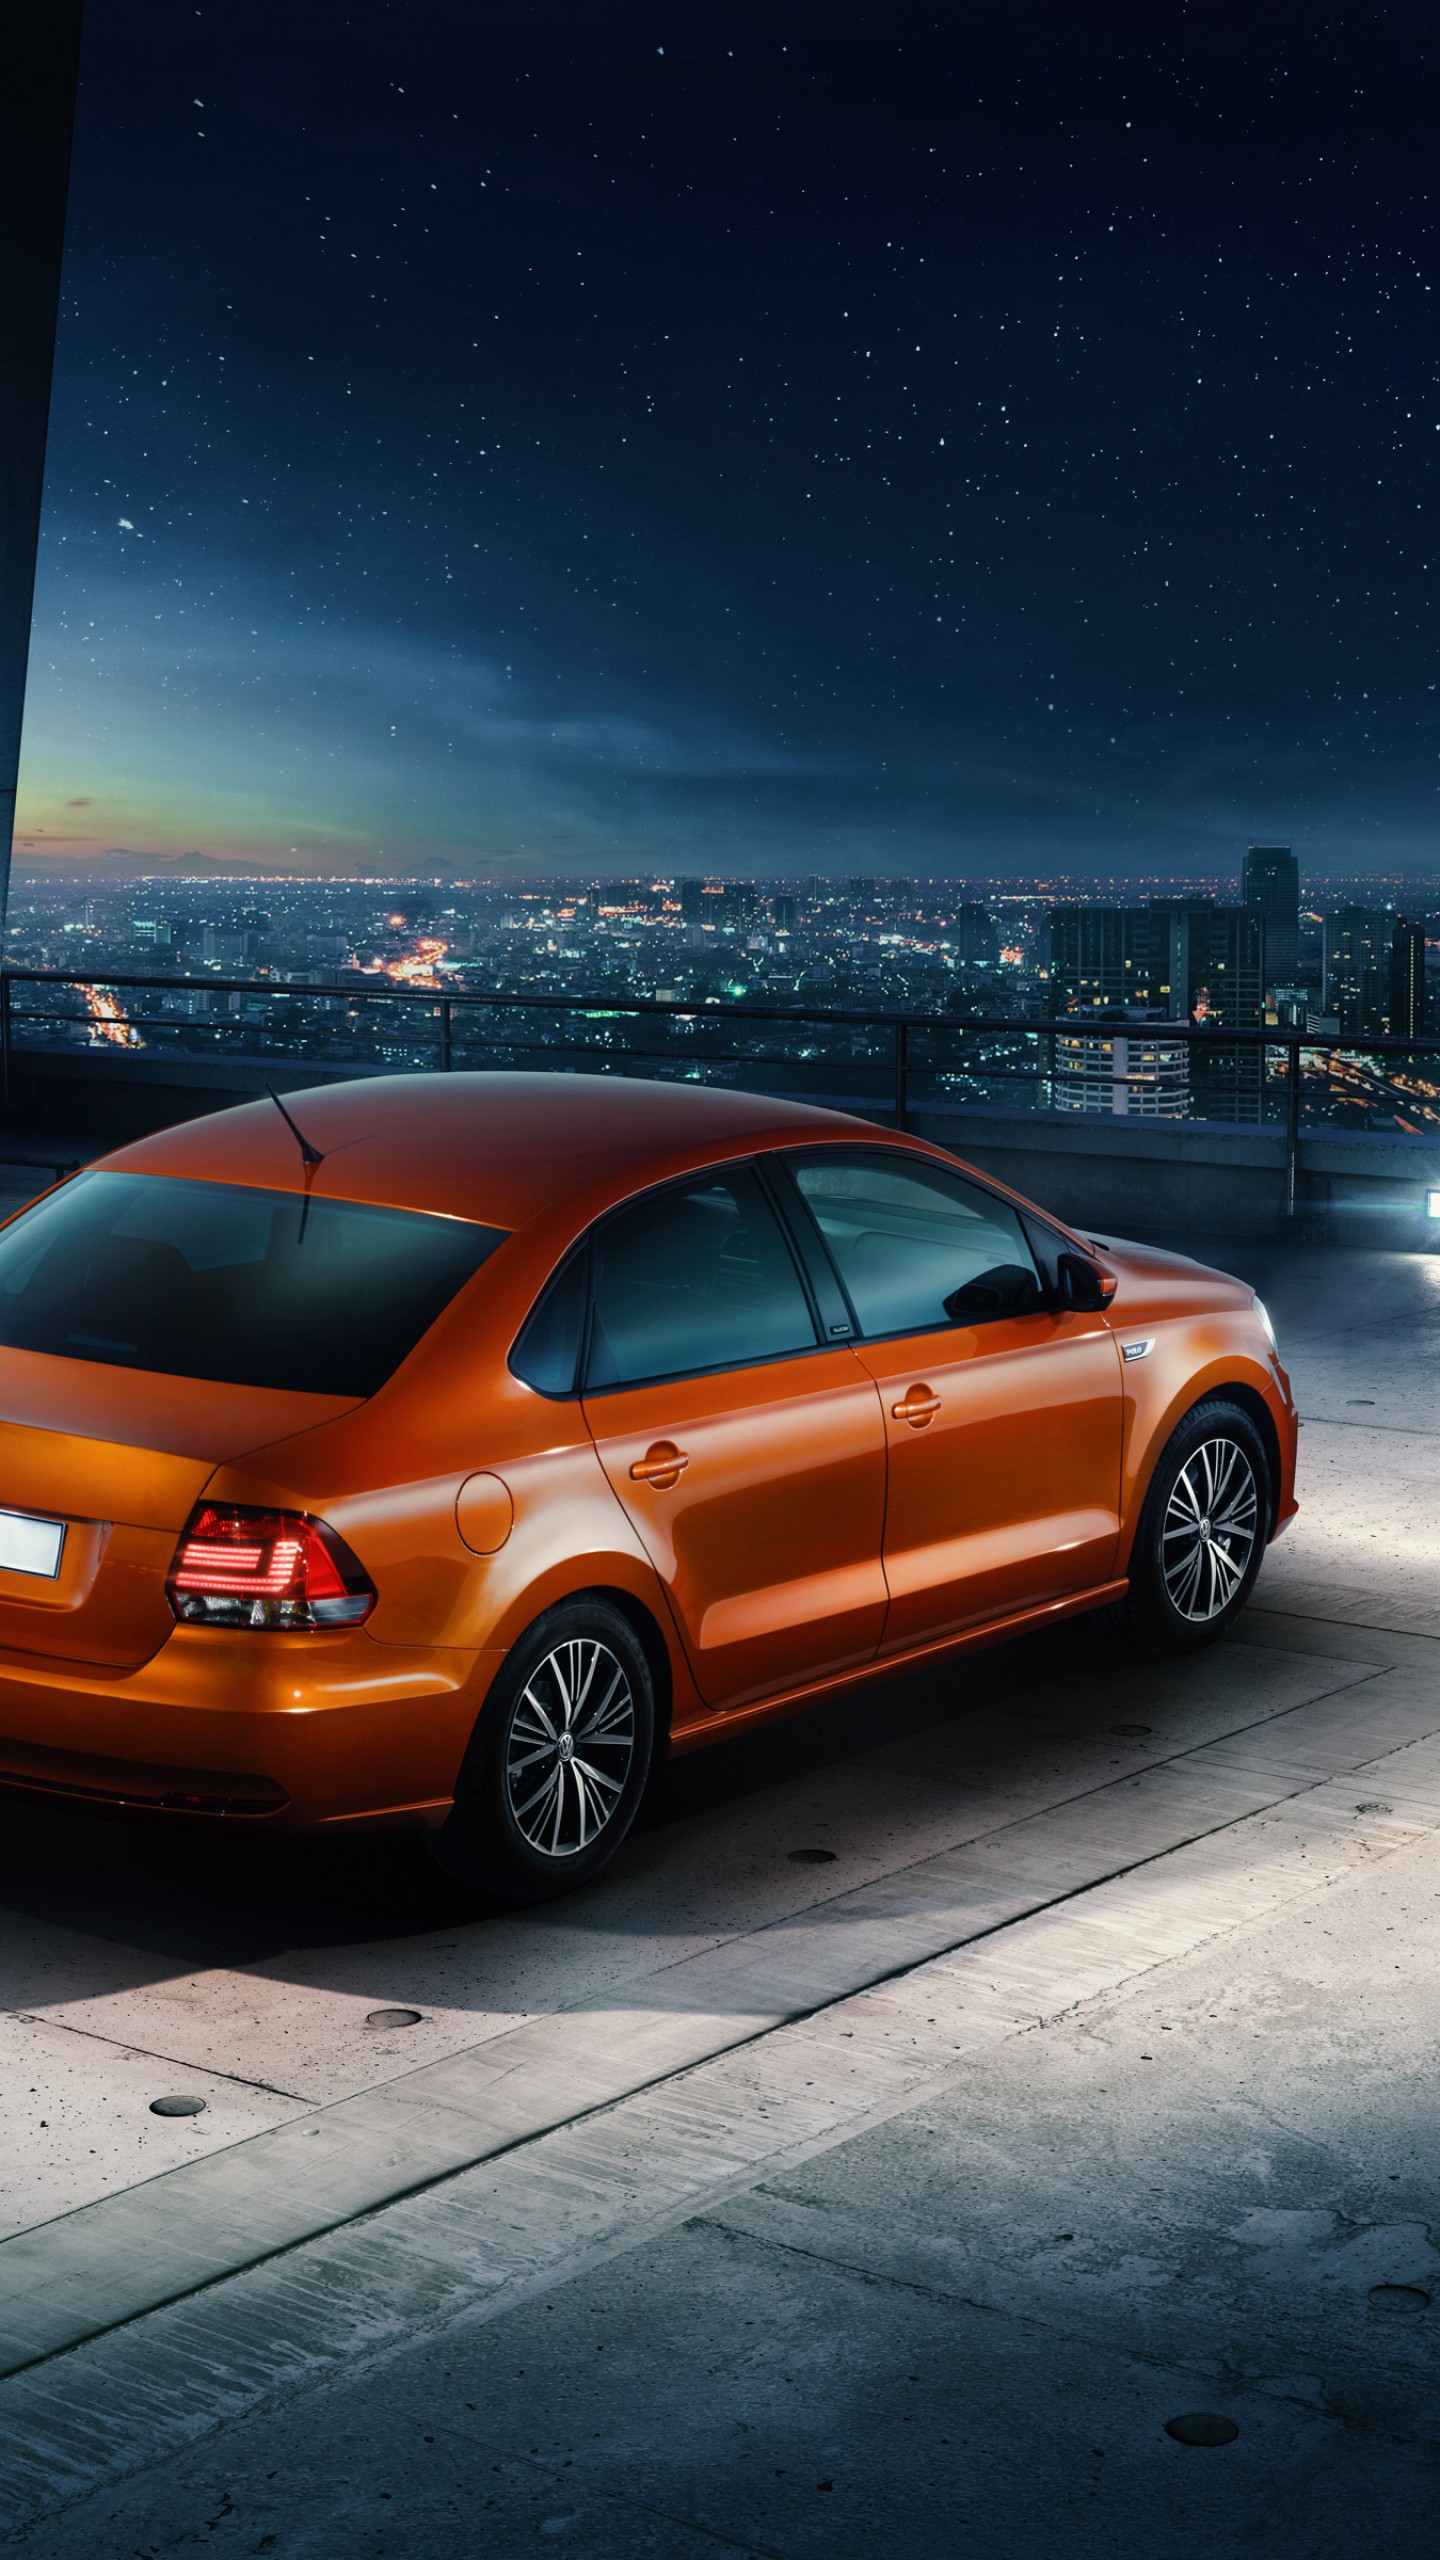 Toyota Of Orange >> Wallpaper Volkswagen Polo Allstar, Sedan, orange, Cars & Bikes #9746